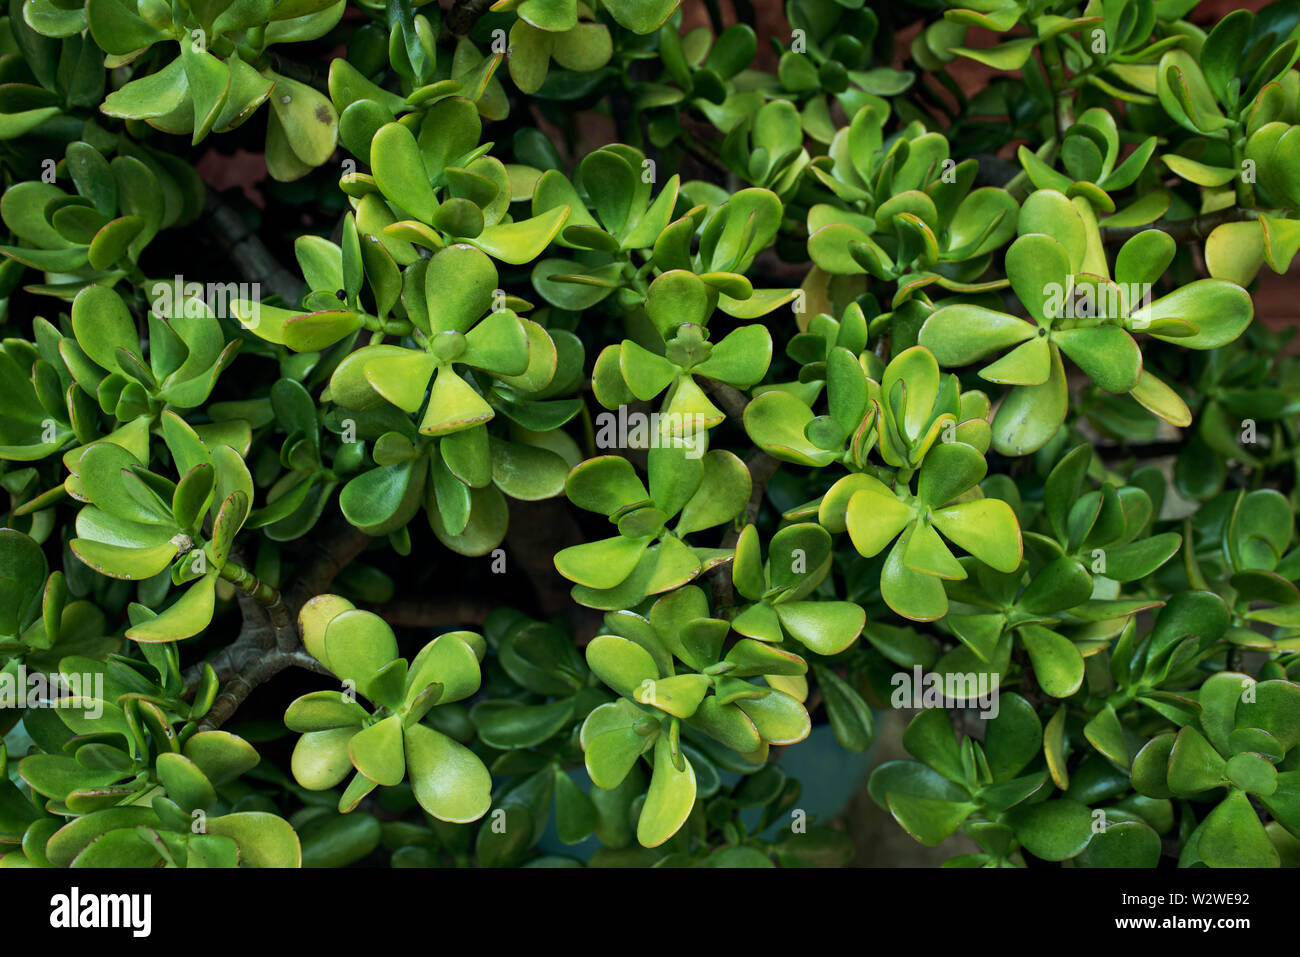 Money Tree Money Plant Jade Plant Is A Common Succulent Houseplant Worldwide Crassula Ovata Rf Close Up Wallpaper Seamless Texture Stock Photo Alamy